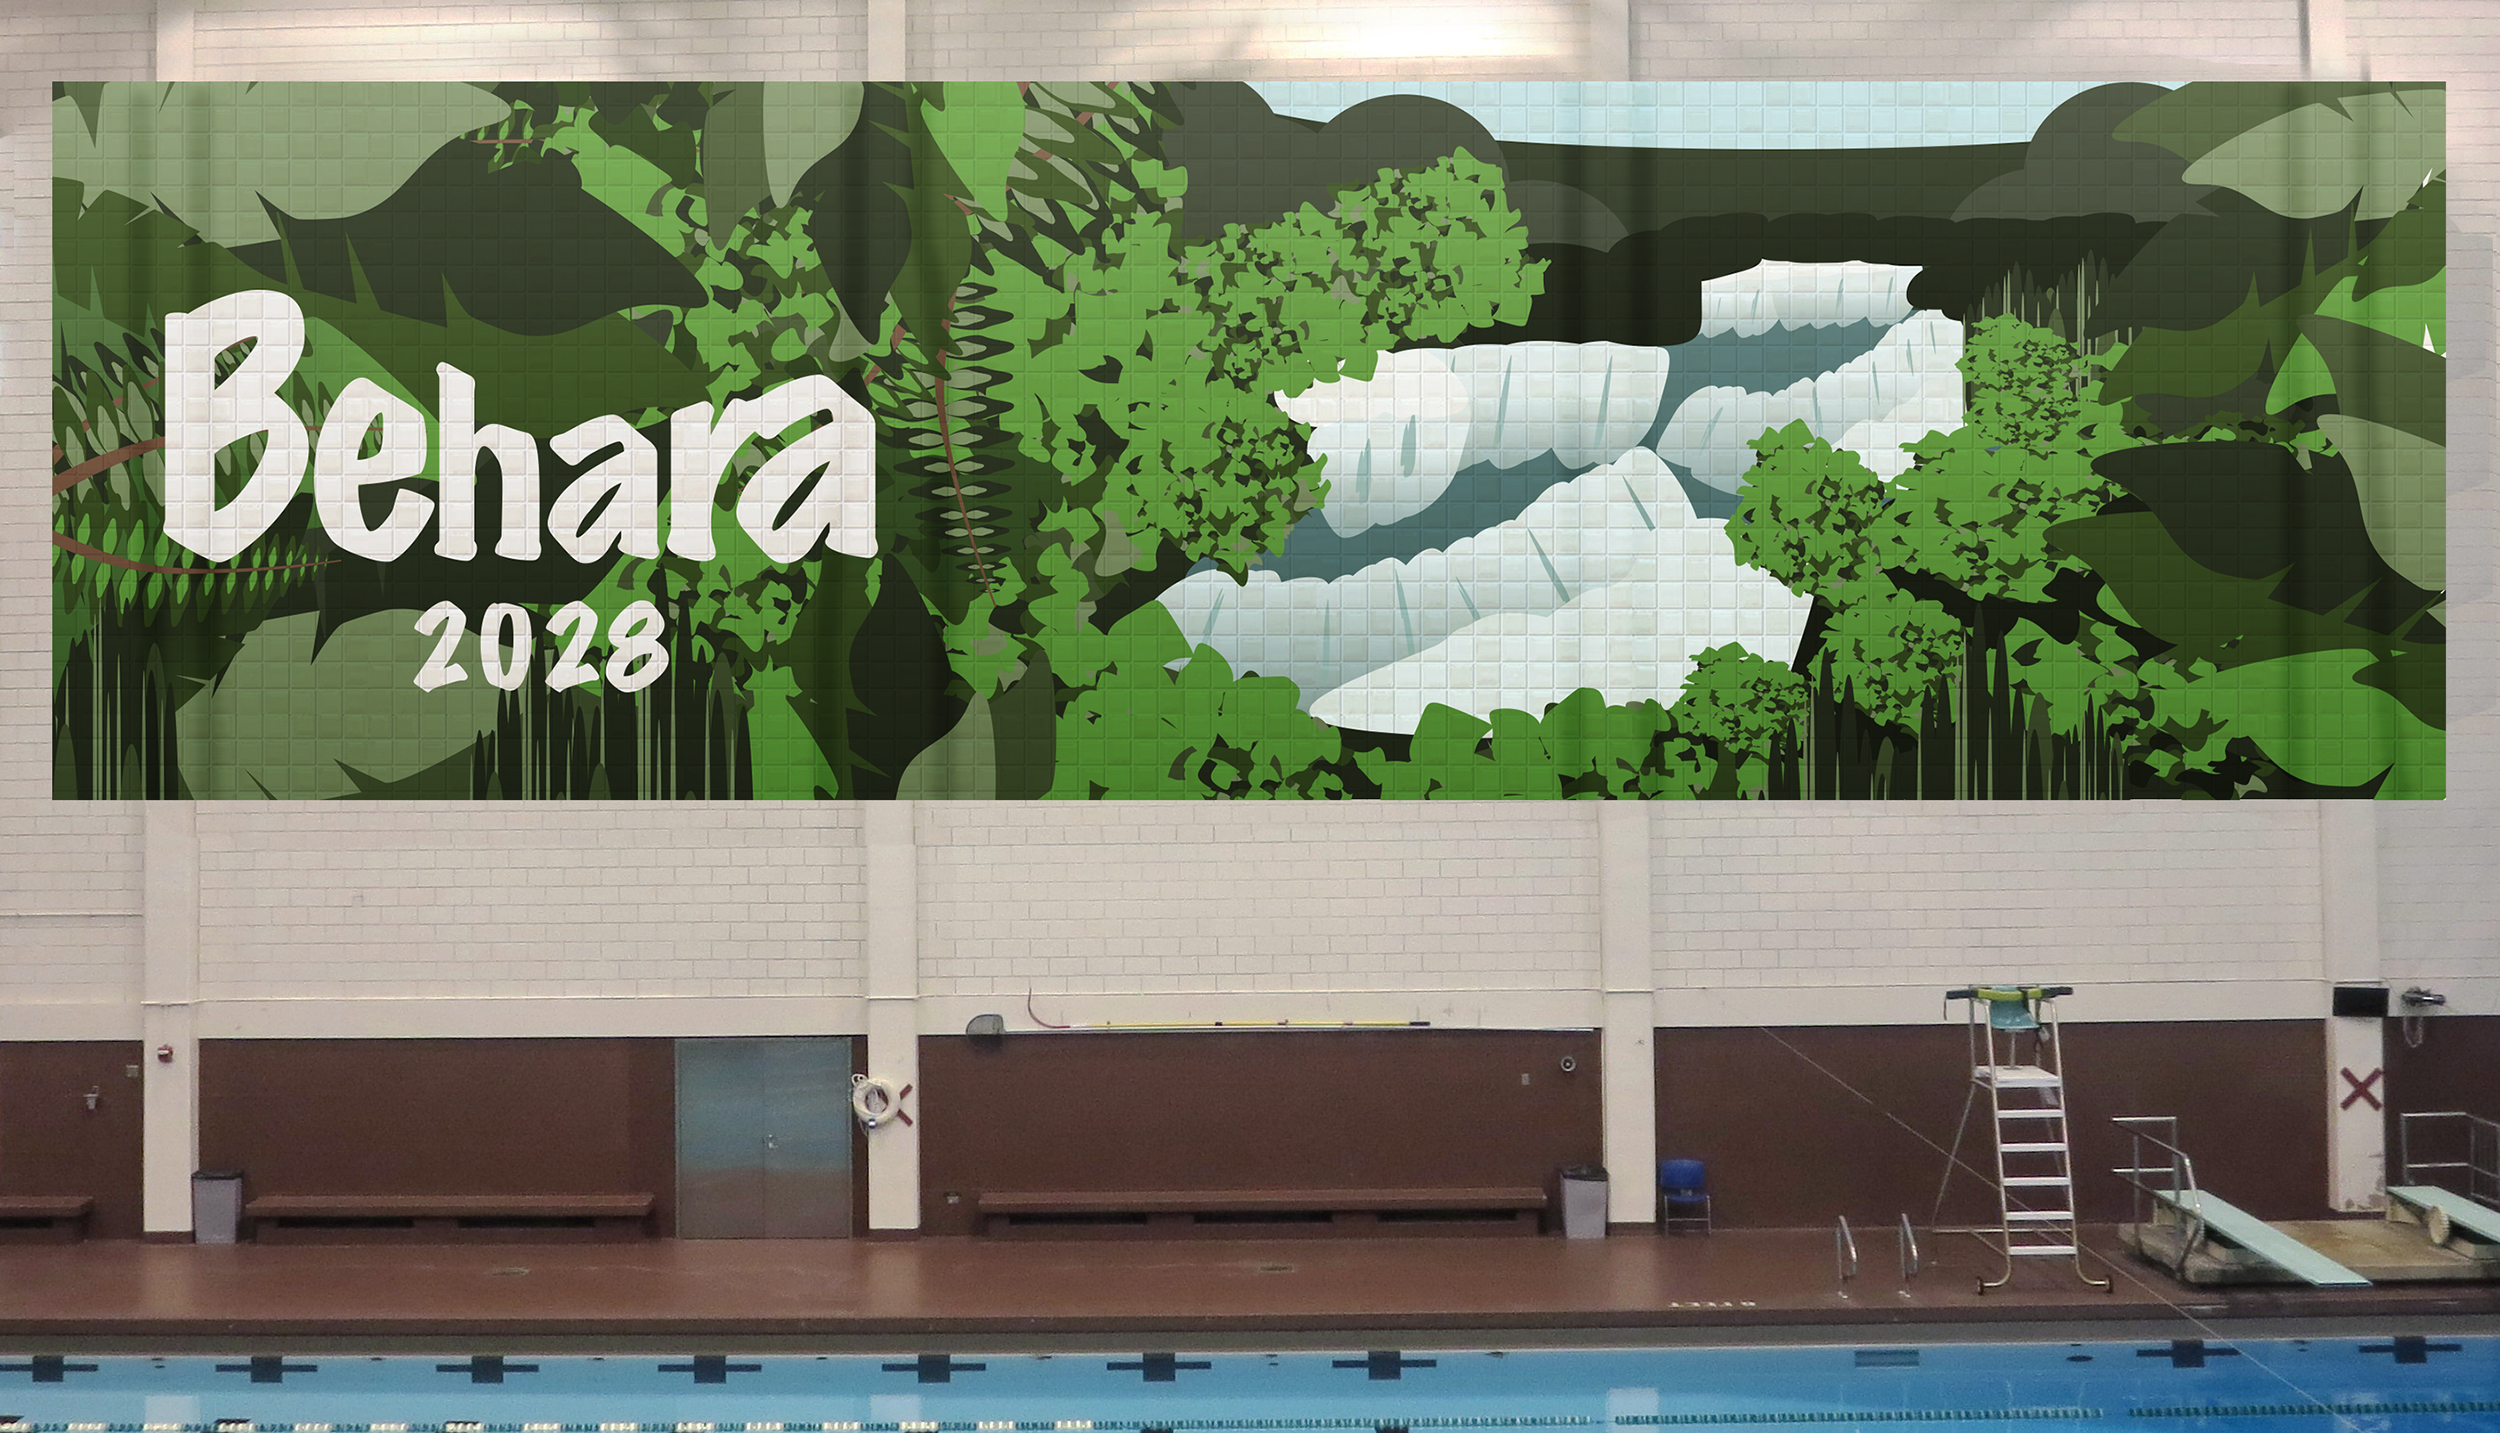 Behara wall mural - designed using Adobe Illustrator and Photoshop